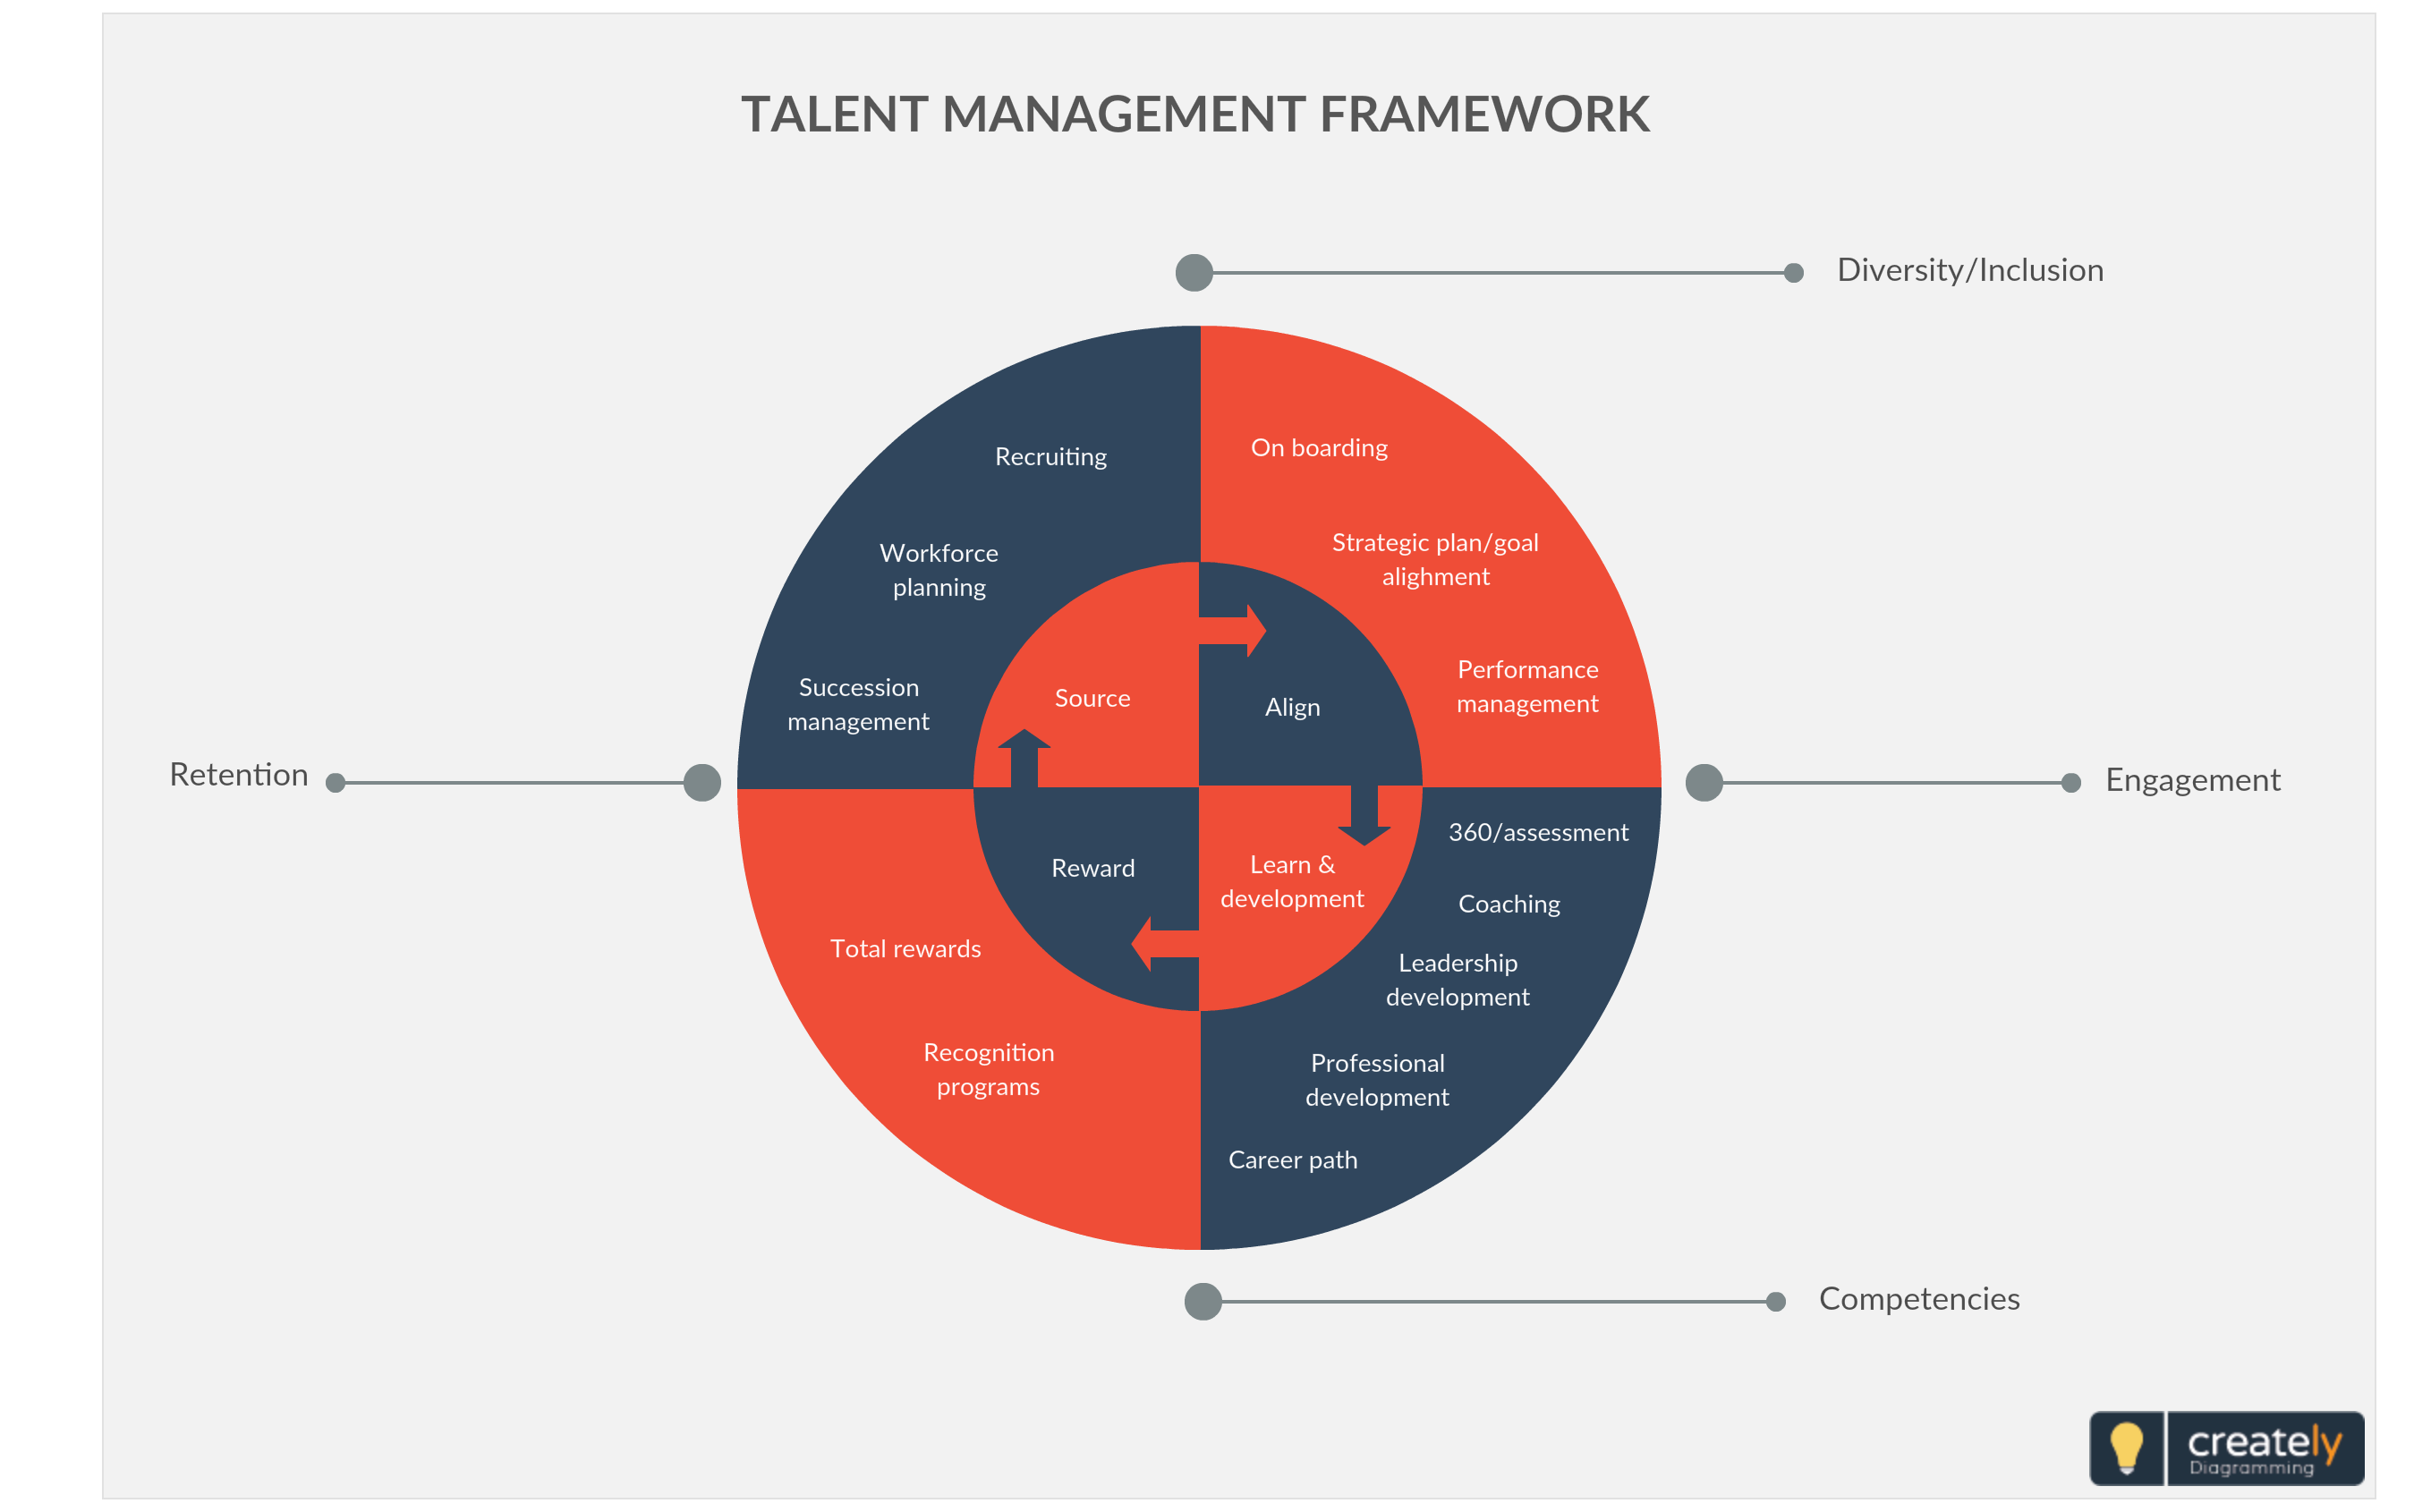 Talent Management Framework Are Human Resource Structures Custom Designed To Suit Certain Human Capital Talent Management Leadership Development Decision Tree